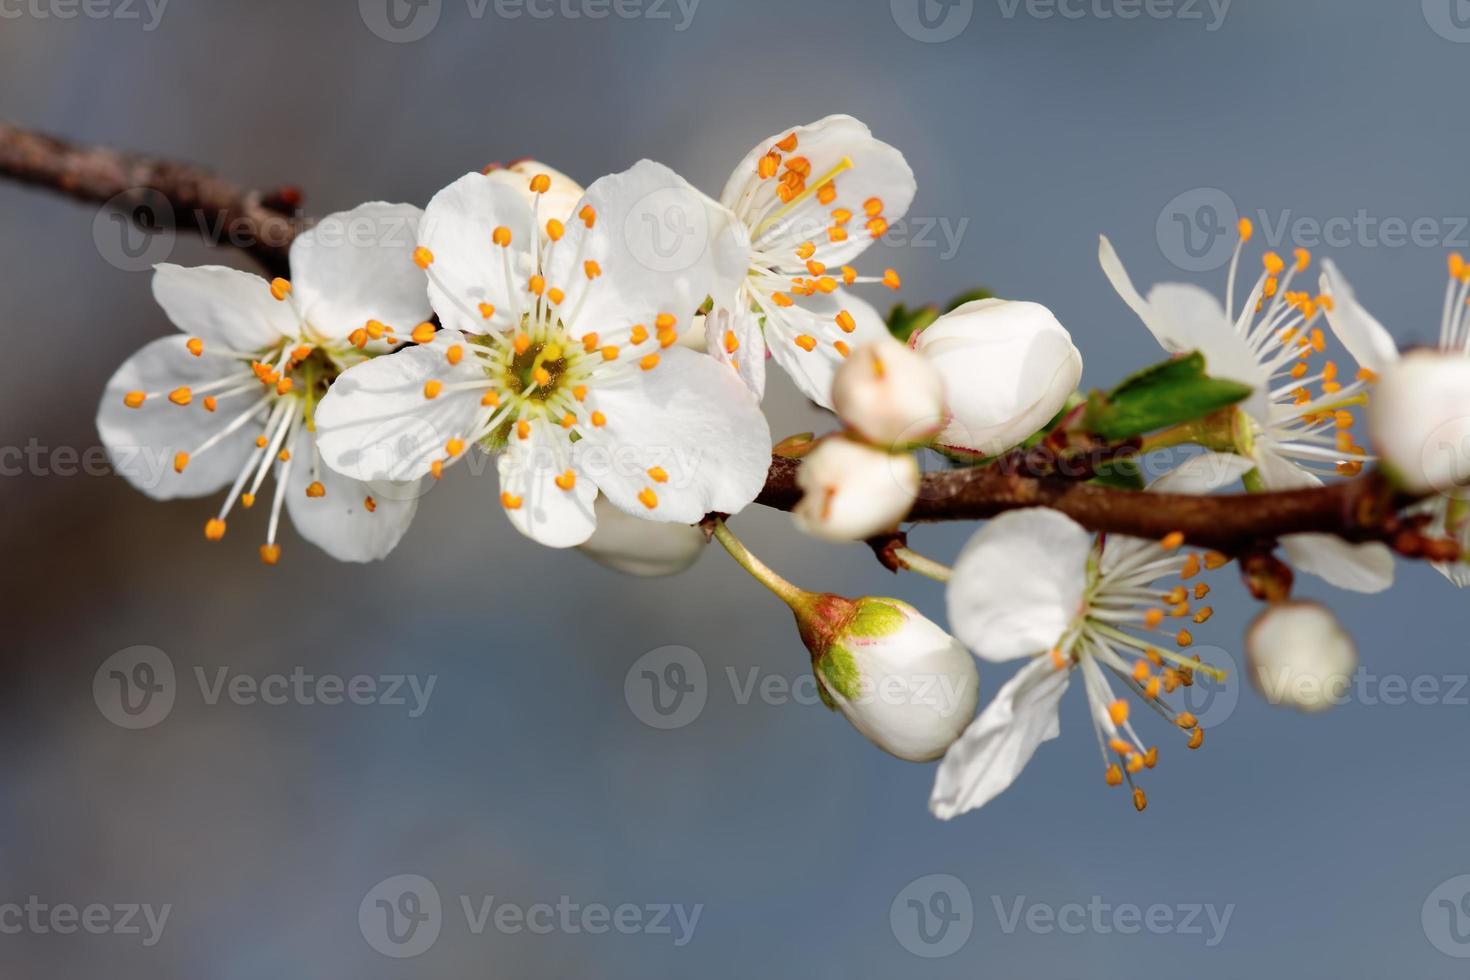 de vruchten bloeien foto